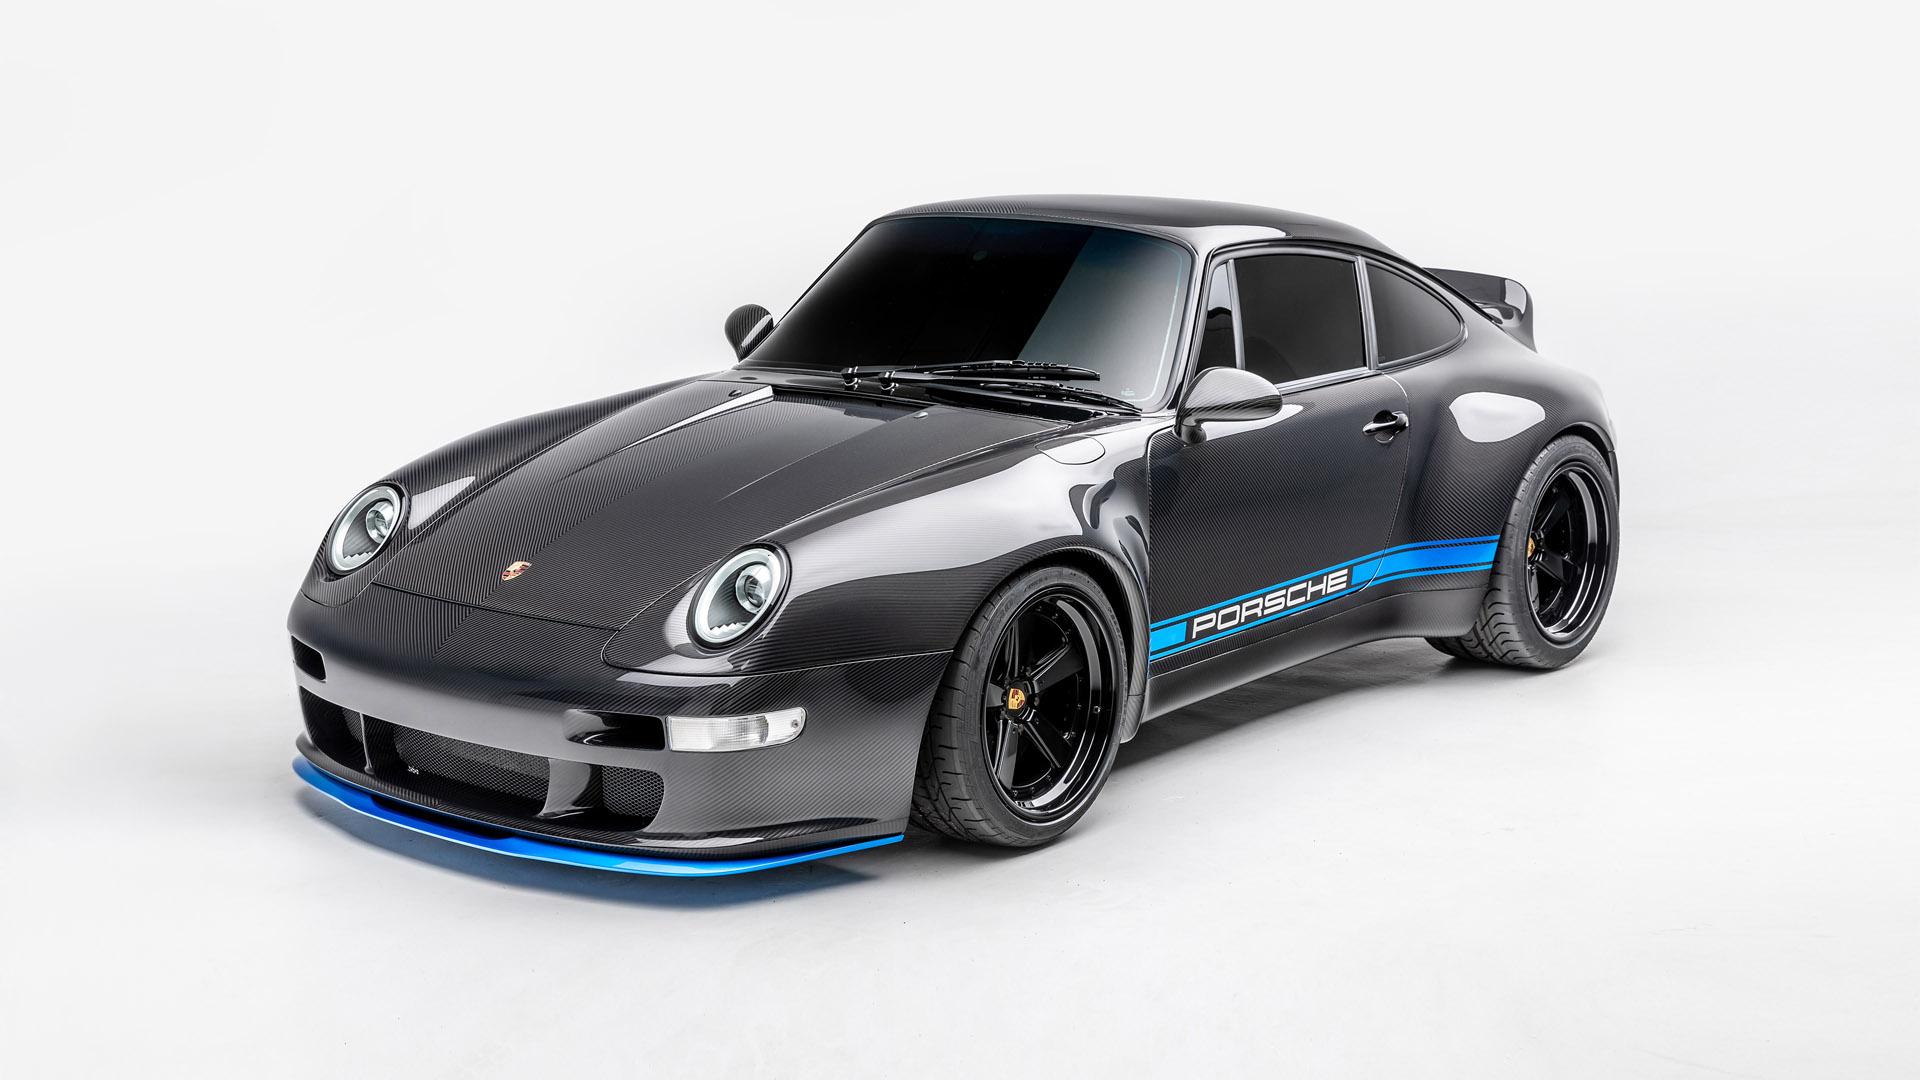 Gunther Werks 993, un restomod muy especial del Porsche 911